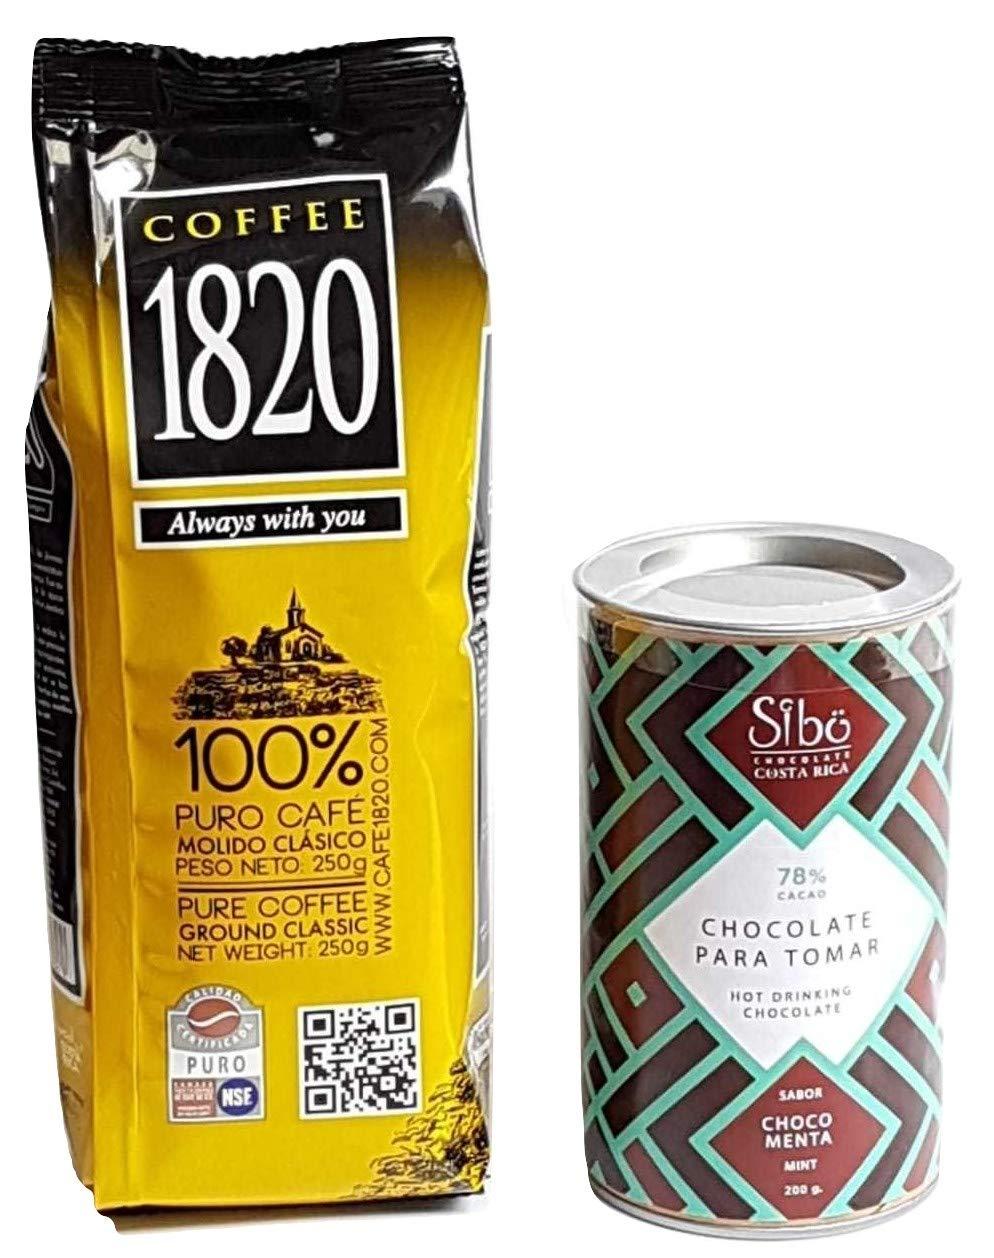 Cafe 1820 Costa Rican Coffee (250 gr) bundled with Sibu Mint Costa ...